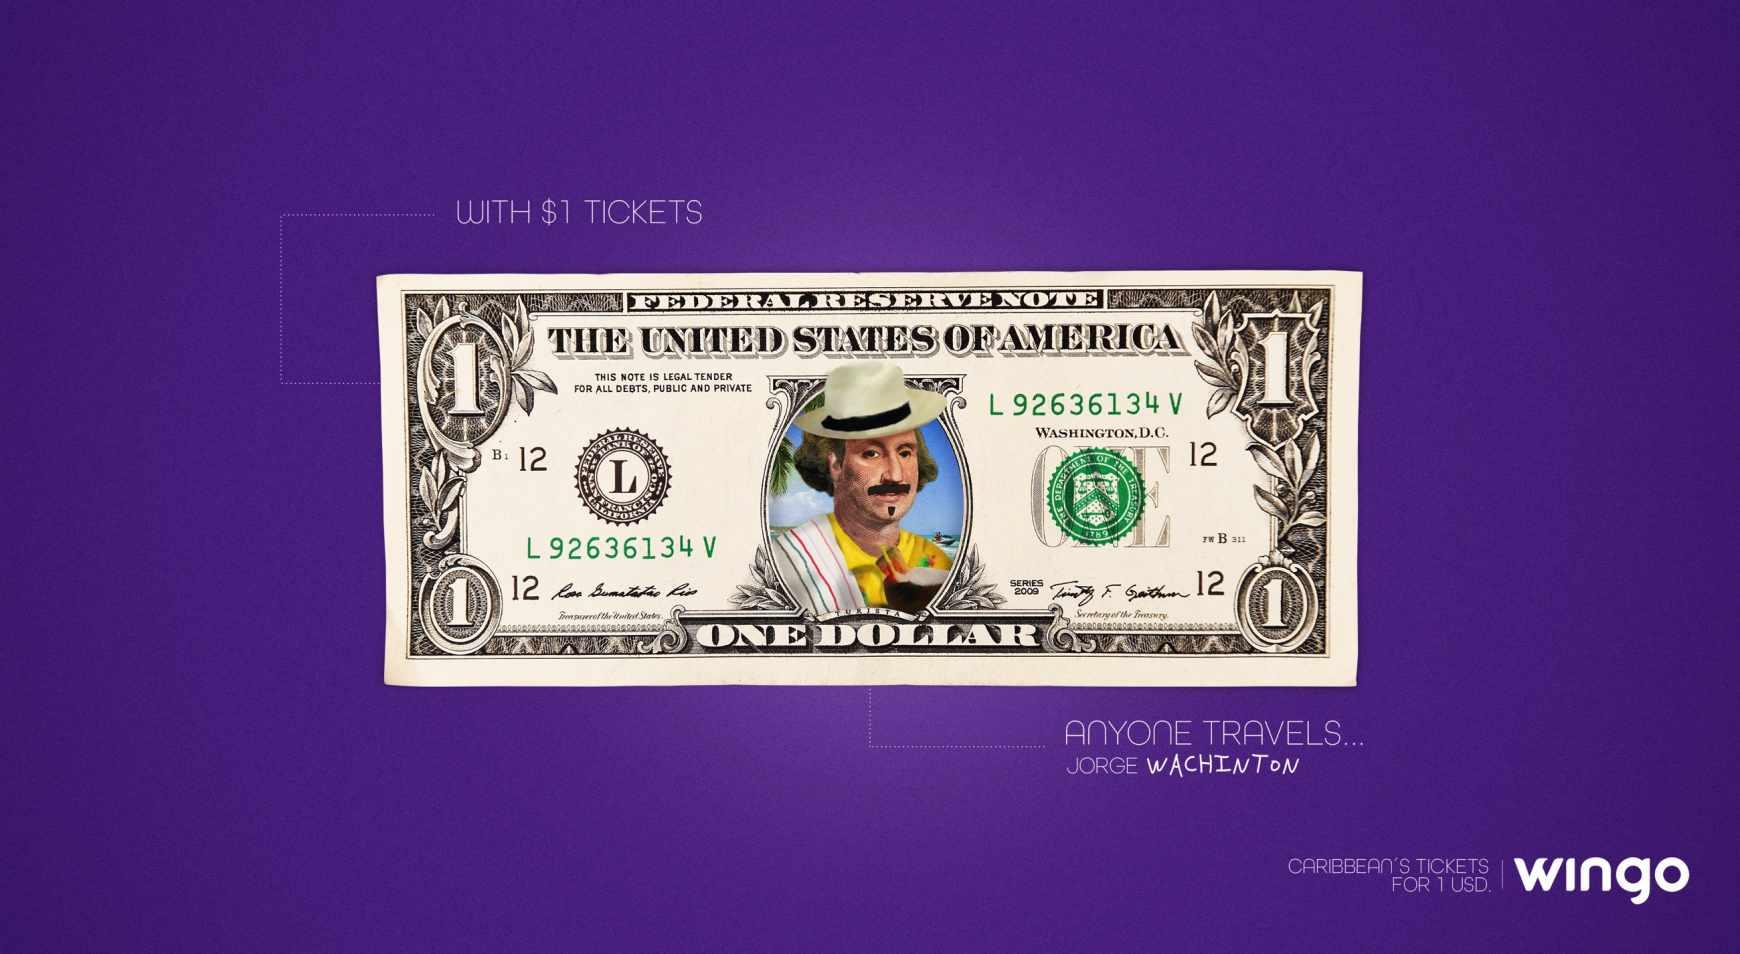 Wingo Print Ad - 1 Dollar Tickets, George Wachinton